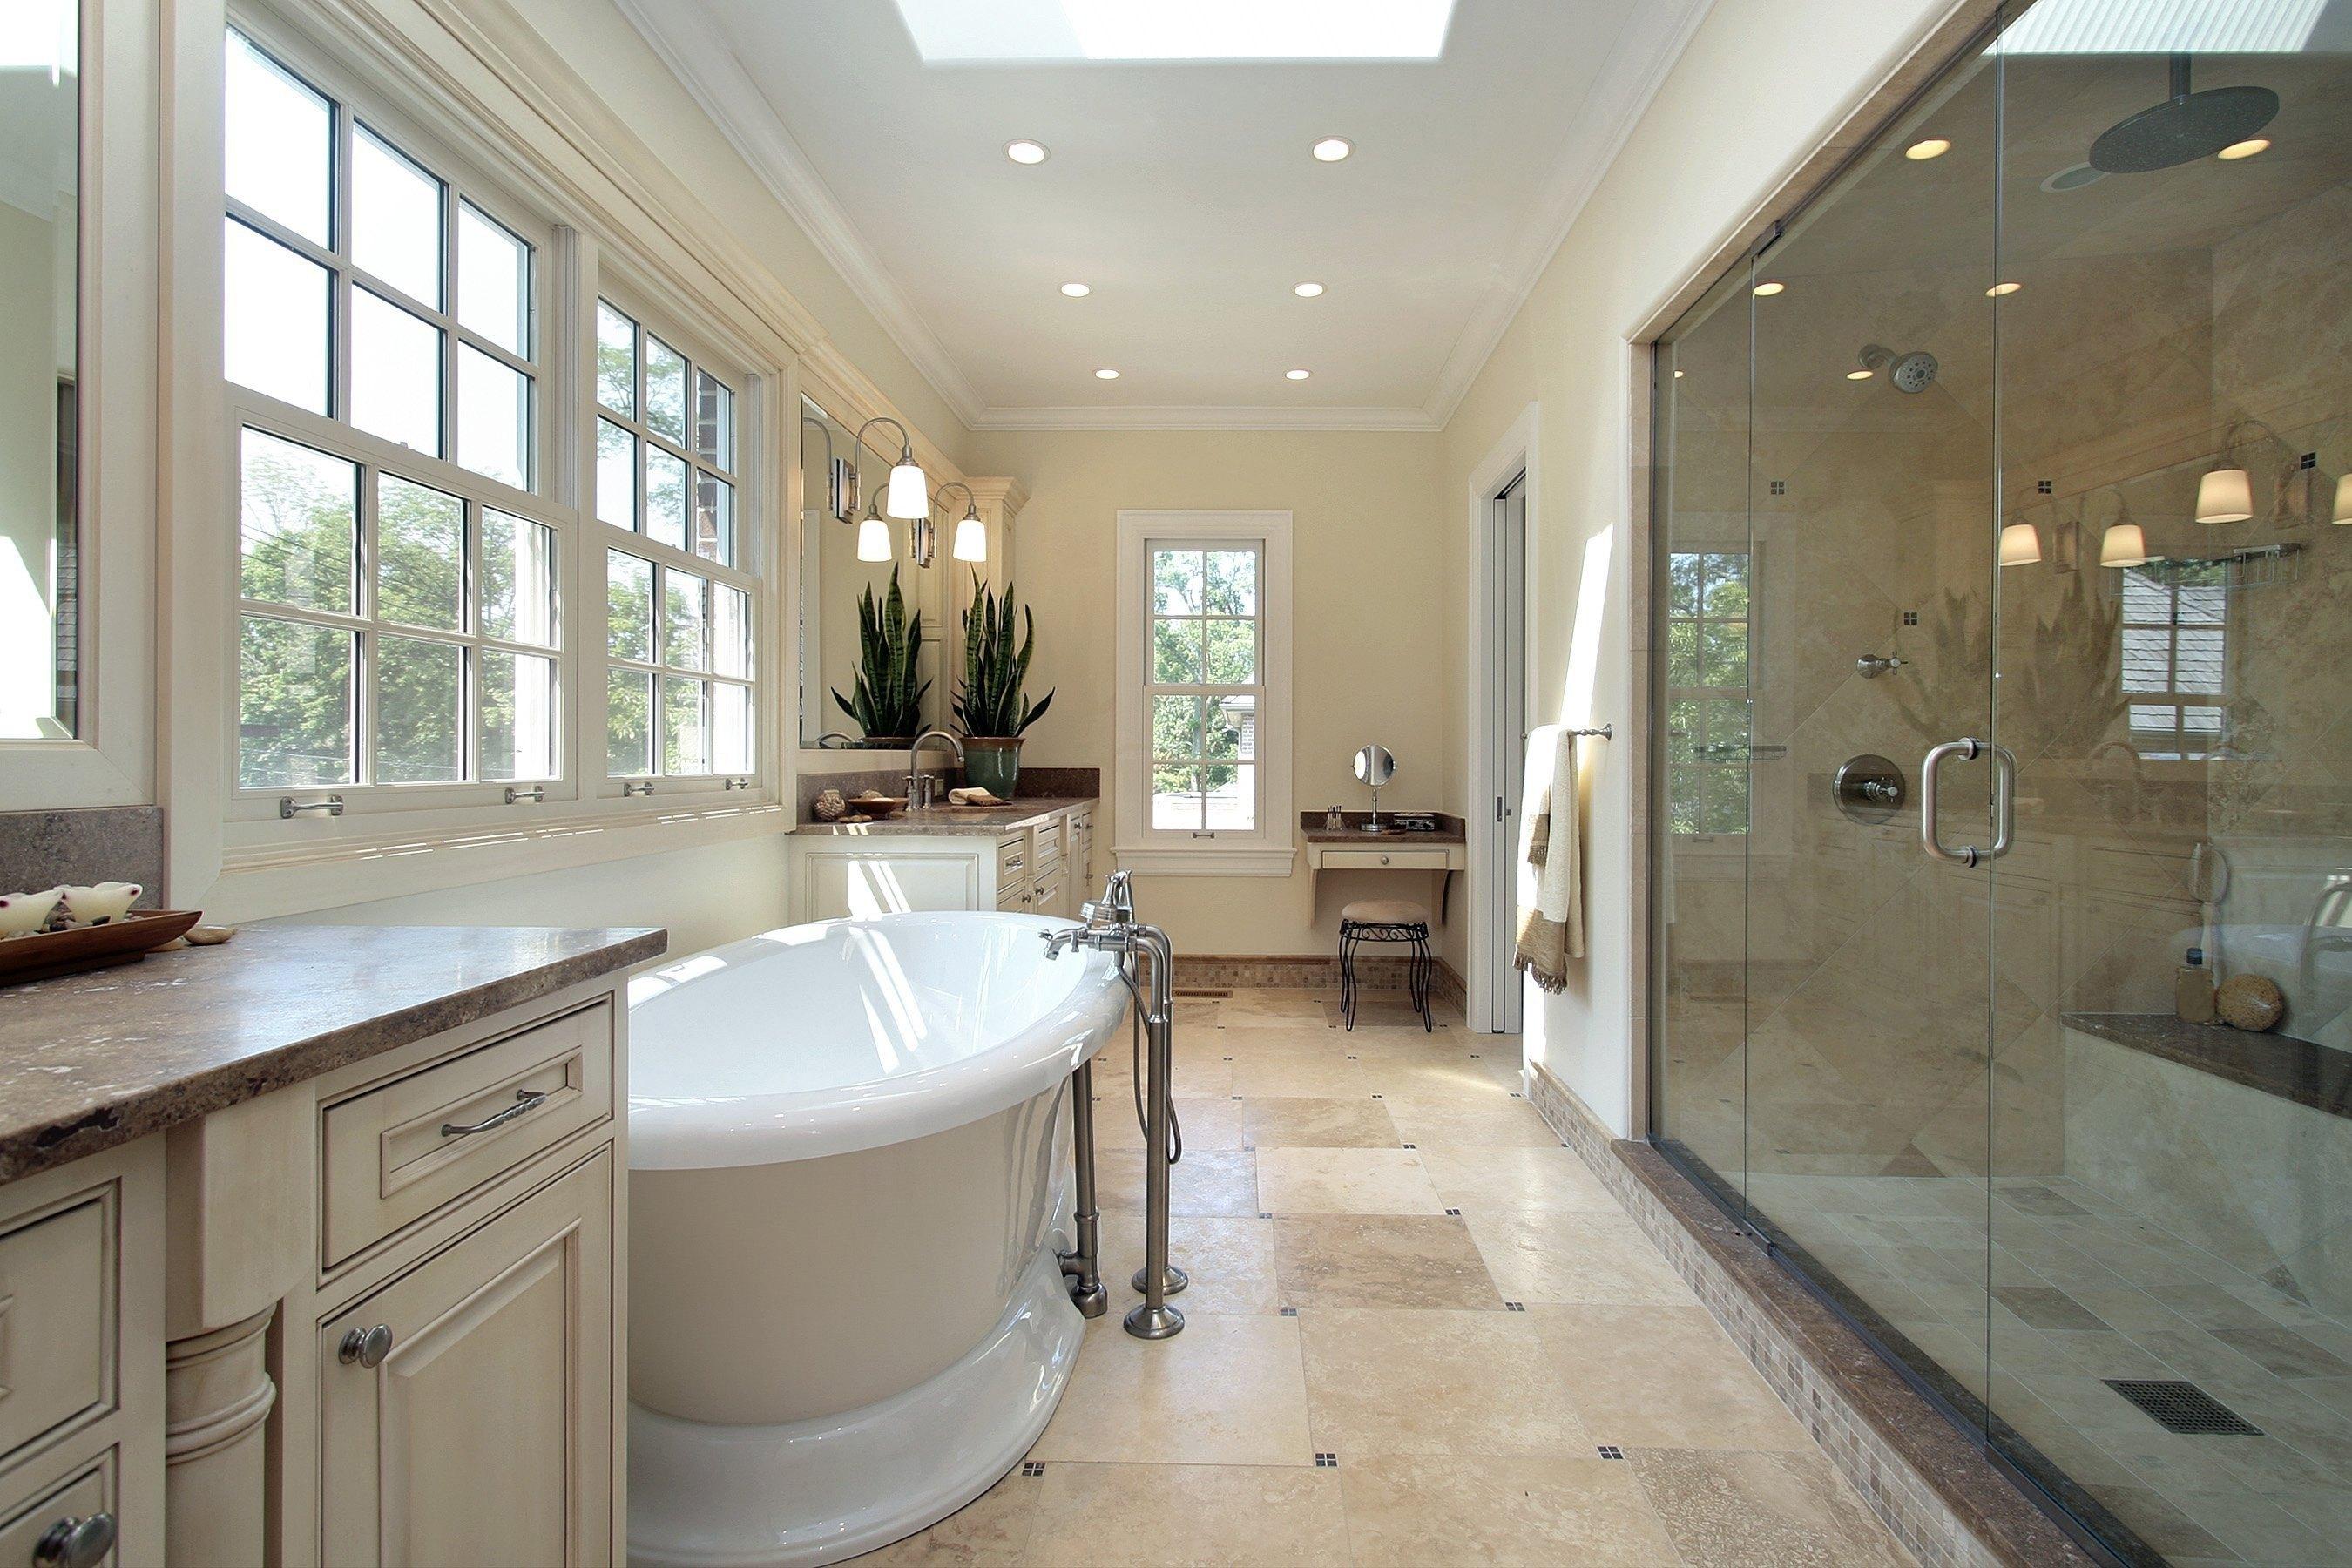 pictures of designer bathrooms interior design modern office inside designer  bathrooms extravagance UJQZAZB